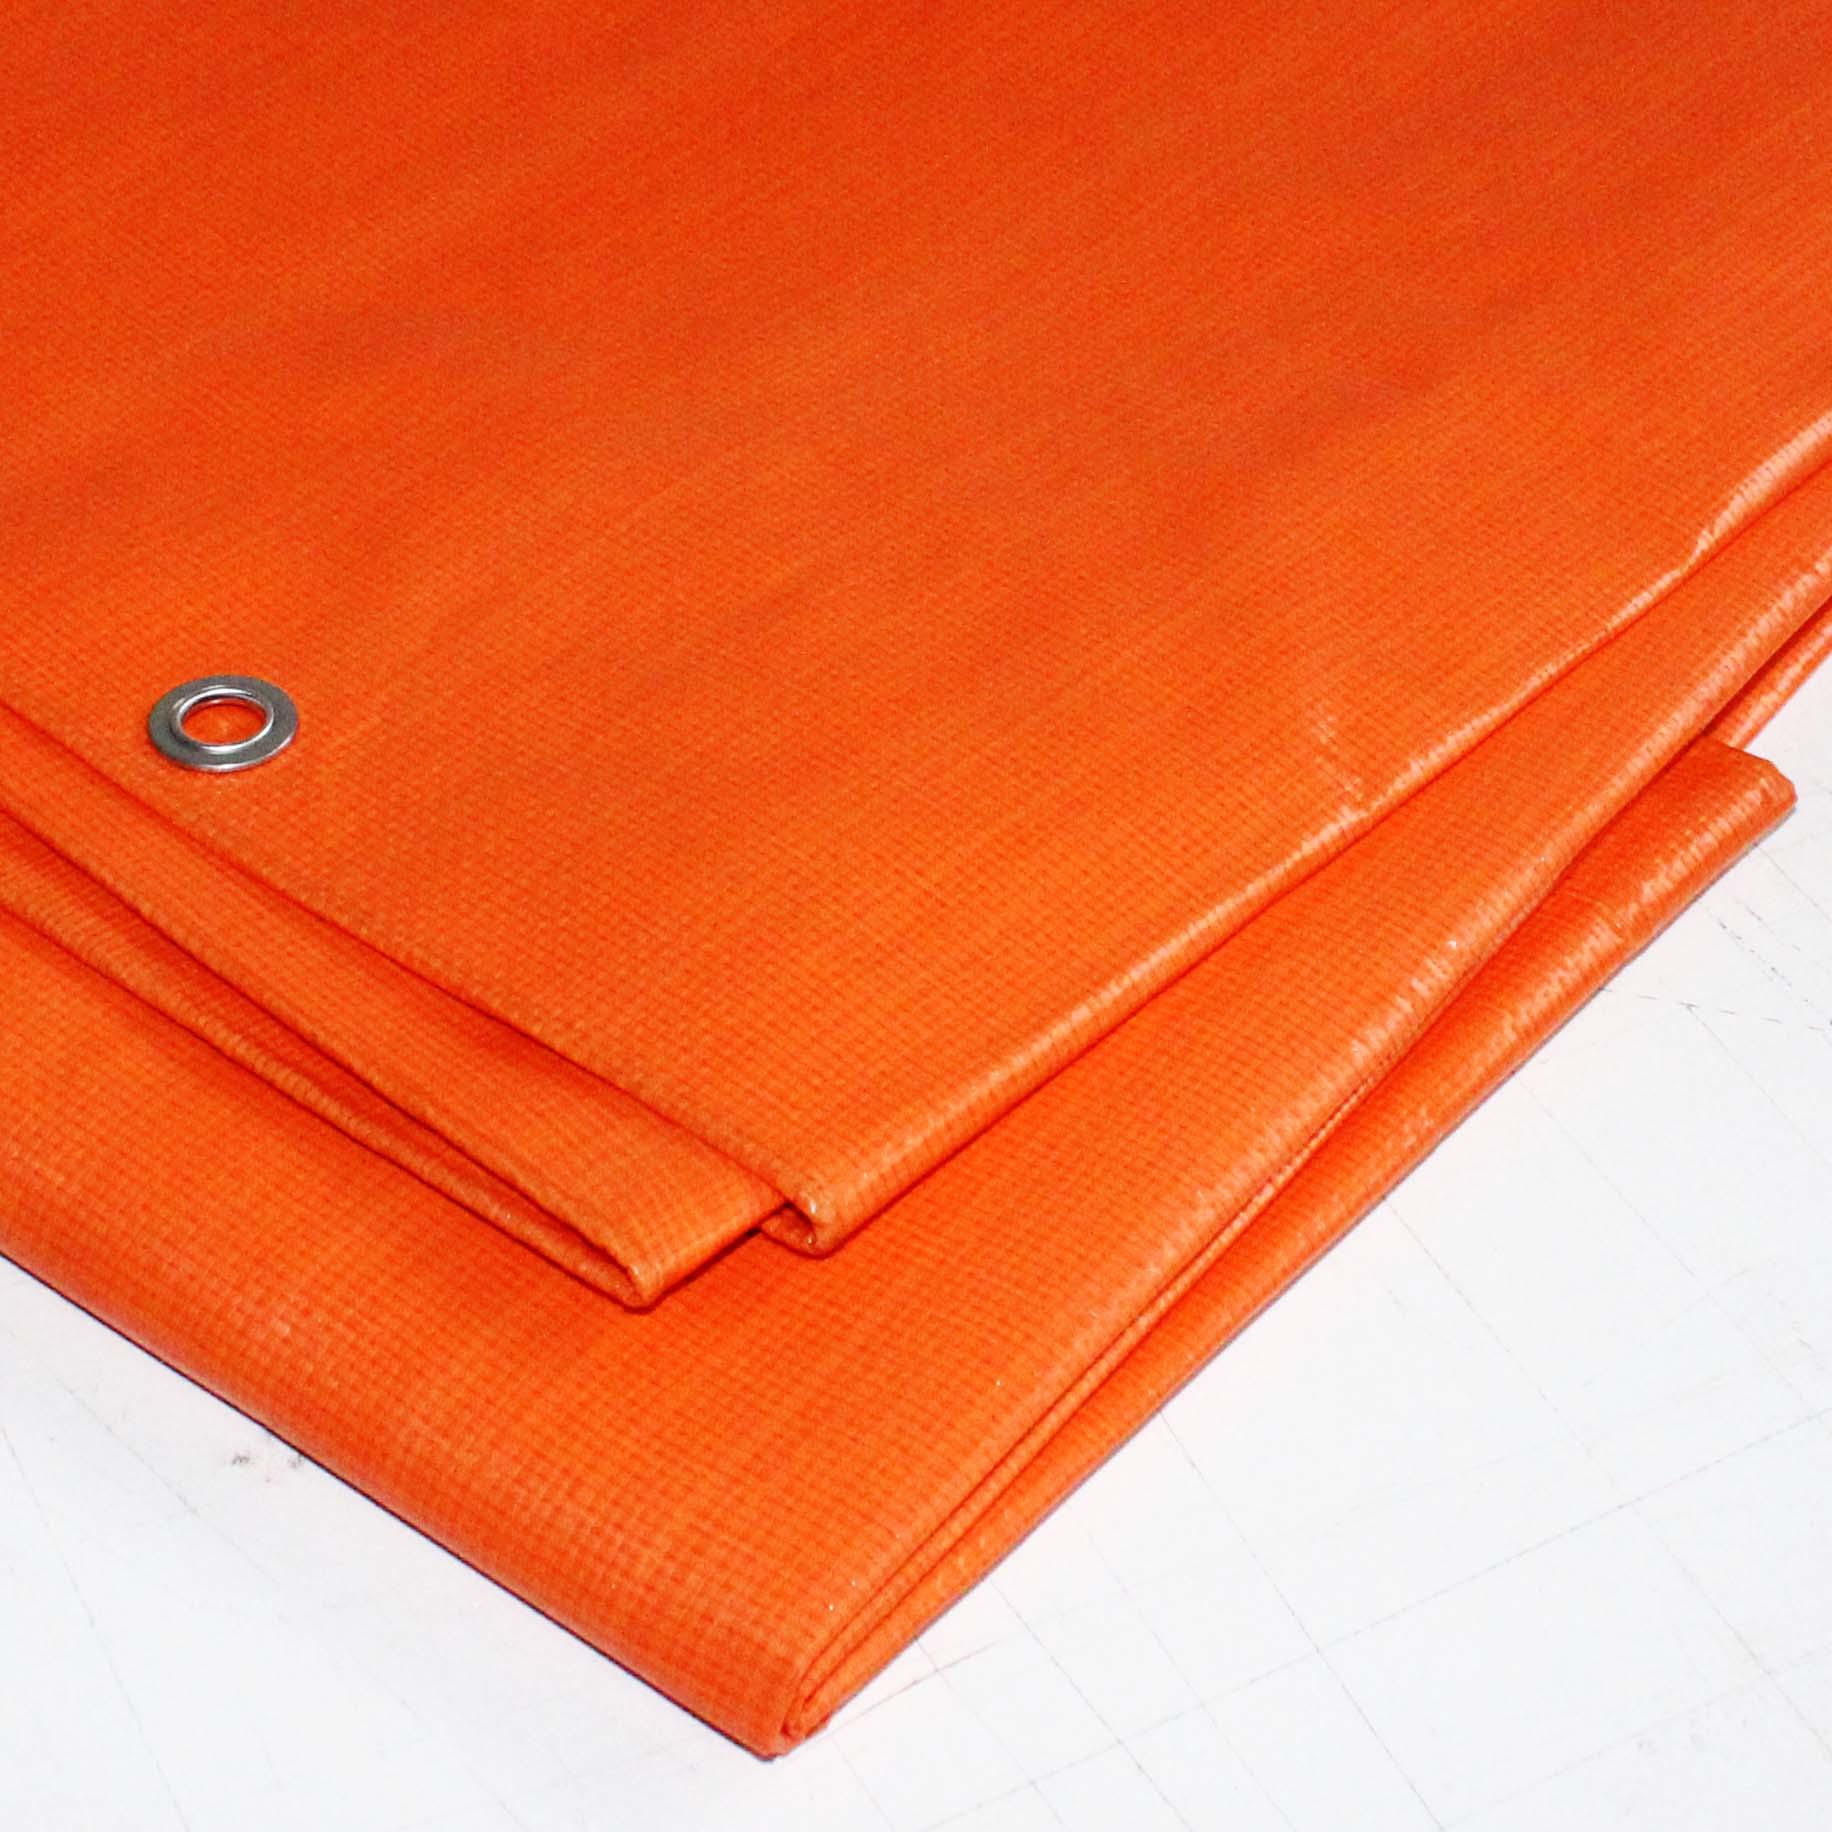 Prolona leve agric laranja 2x2m